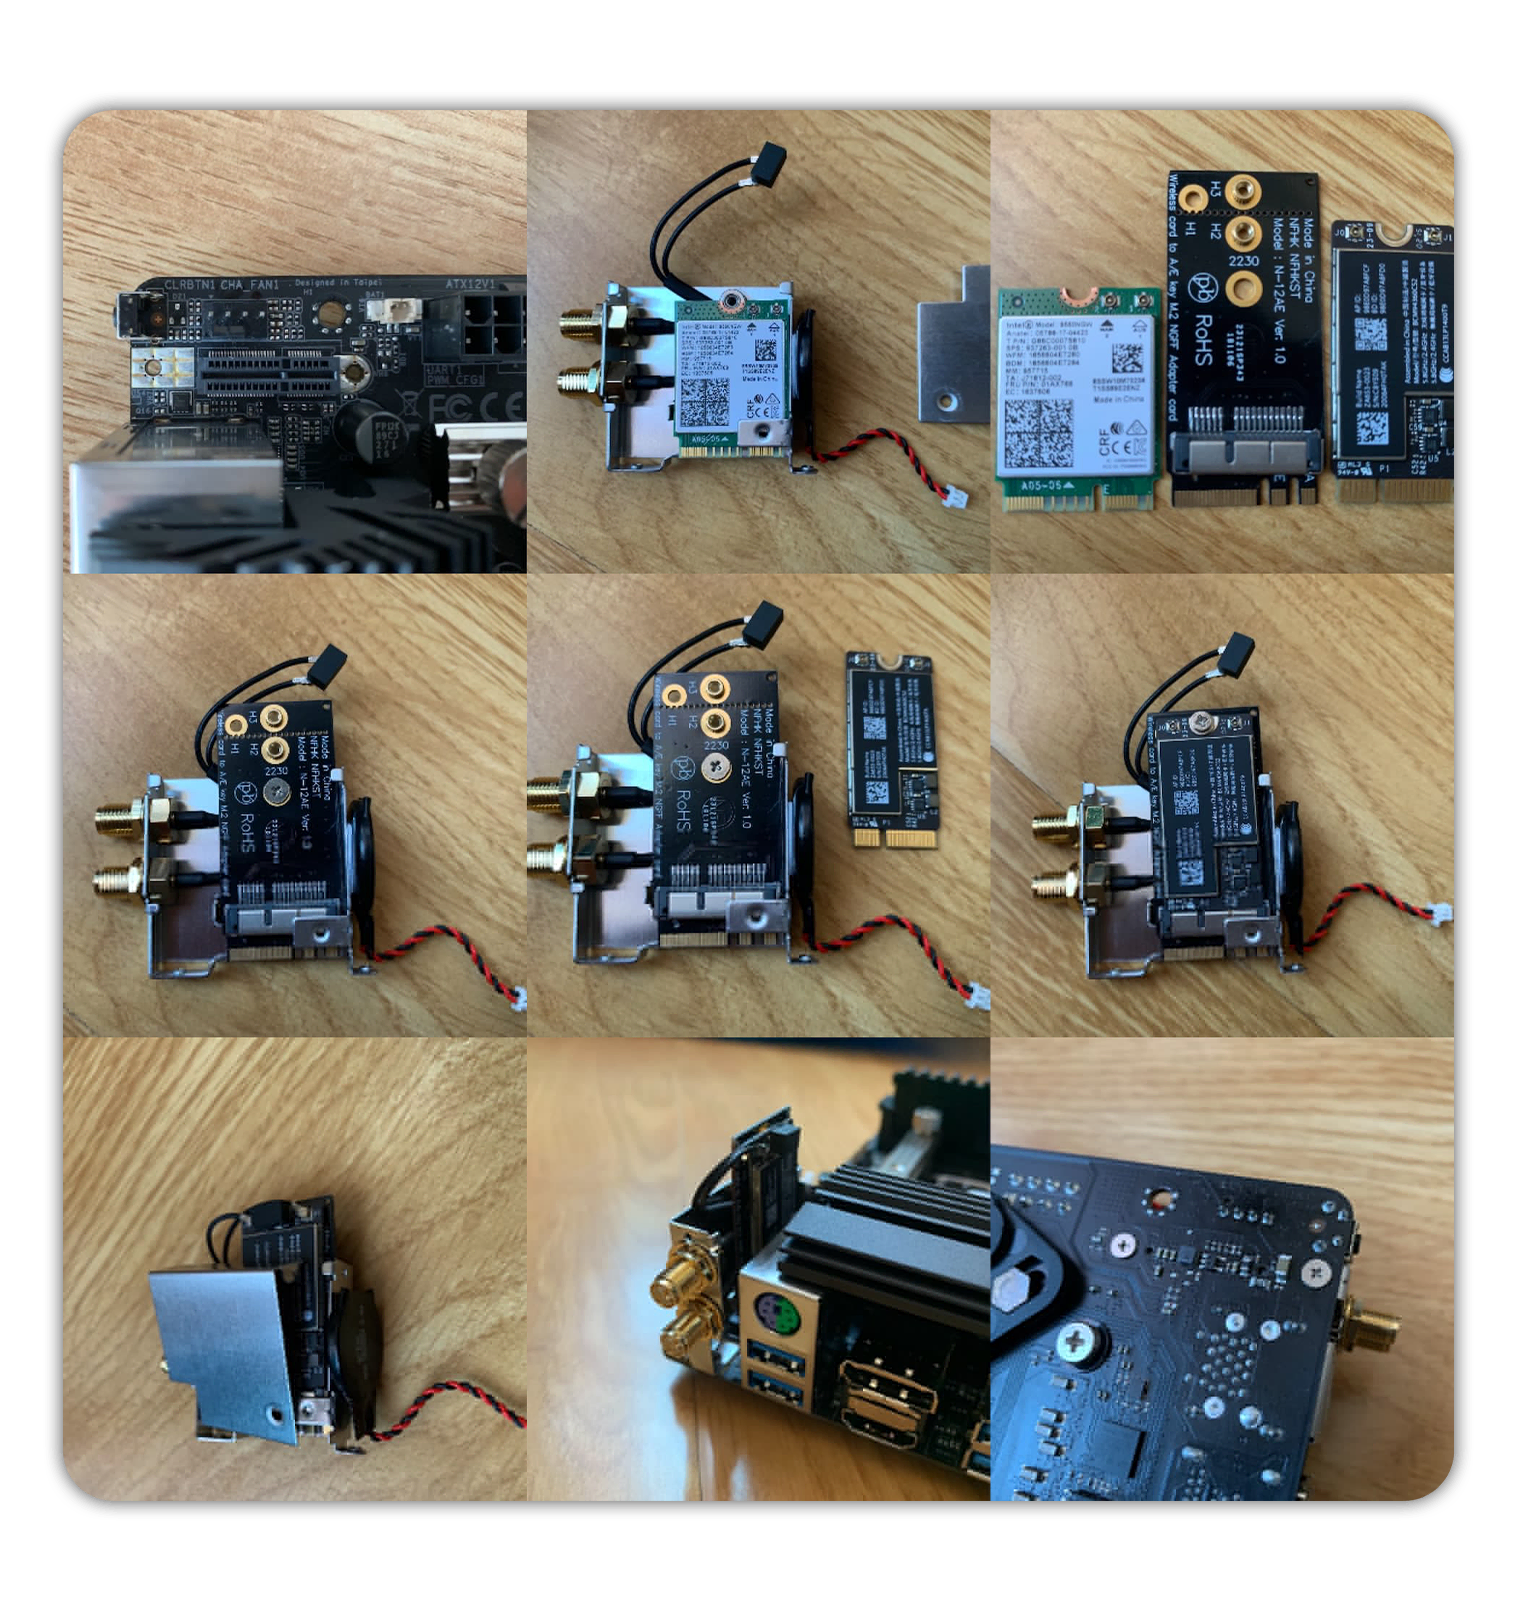 ASRock Z390 phantom gaming-itx/ac i9-9900k RX5700